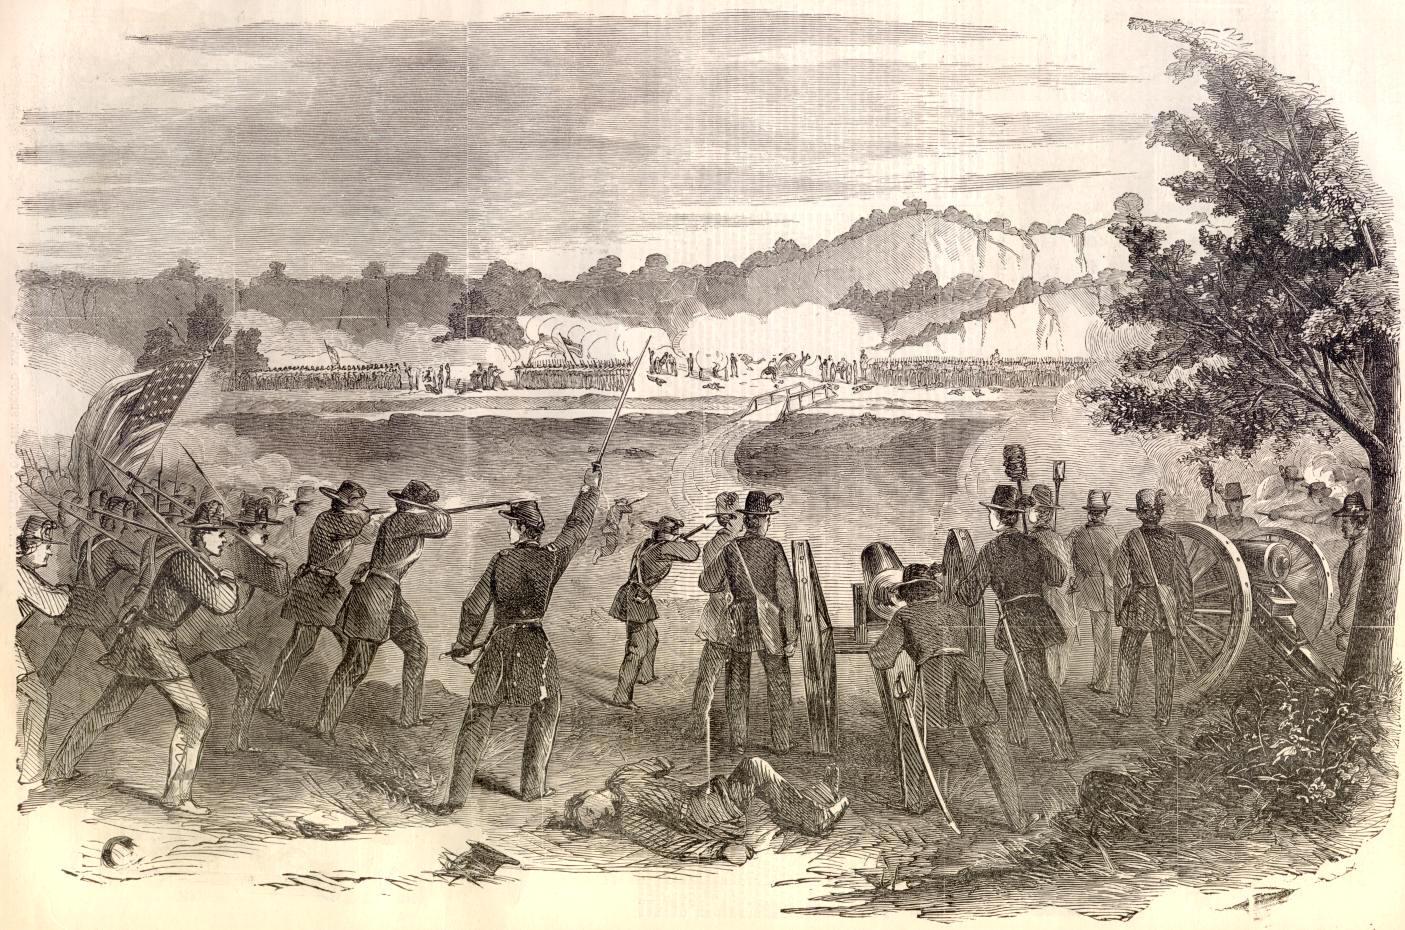 File:Battle of Carthage (1861).jpg